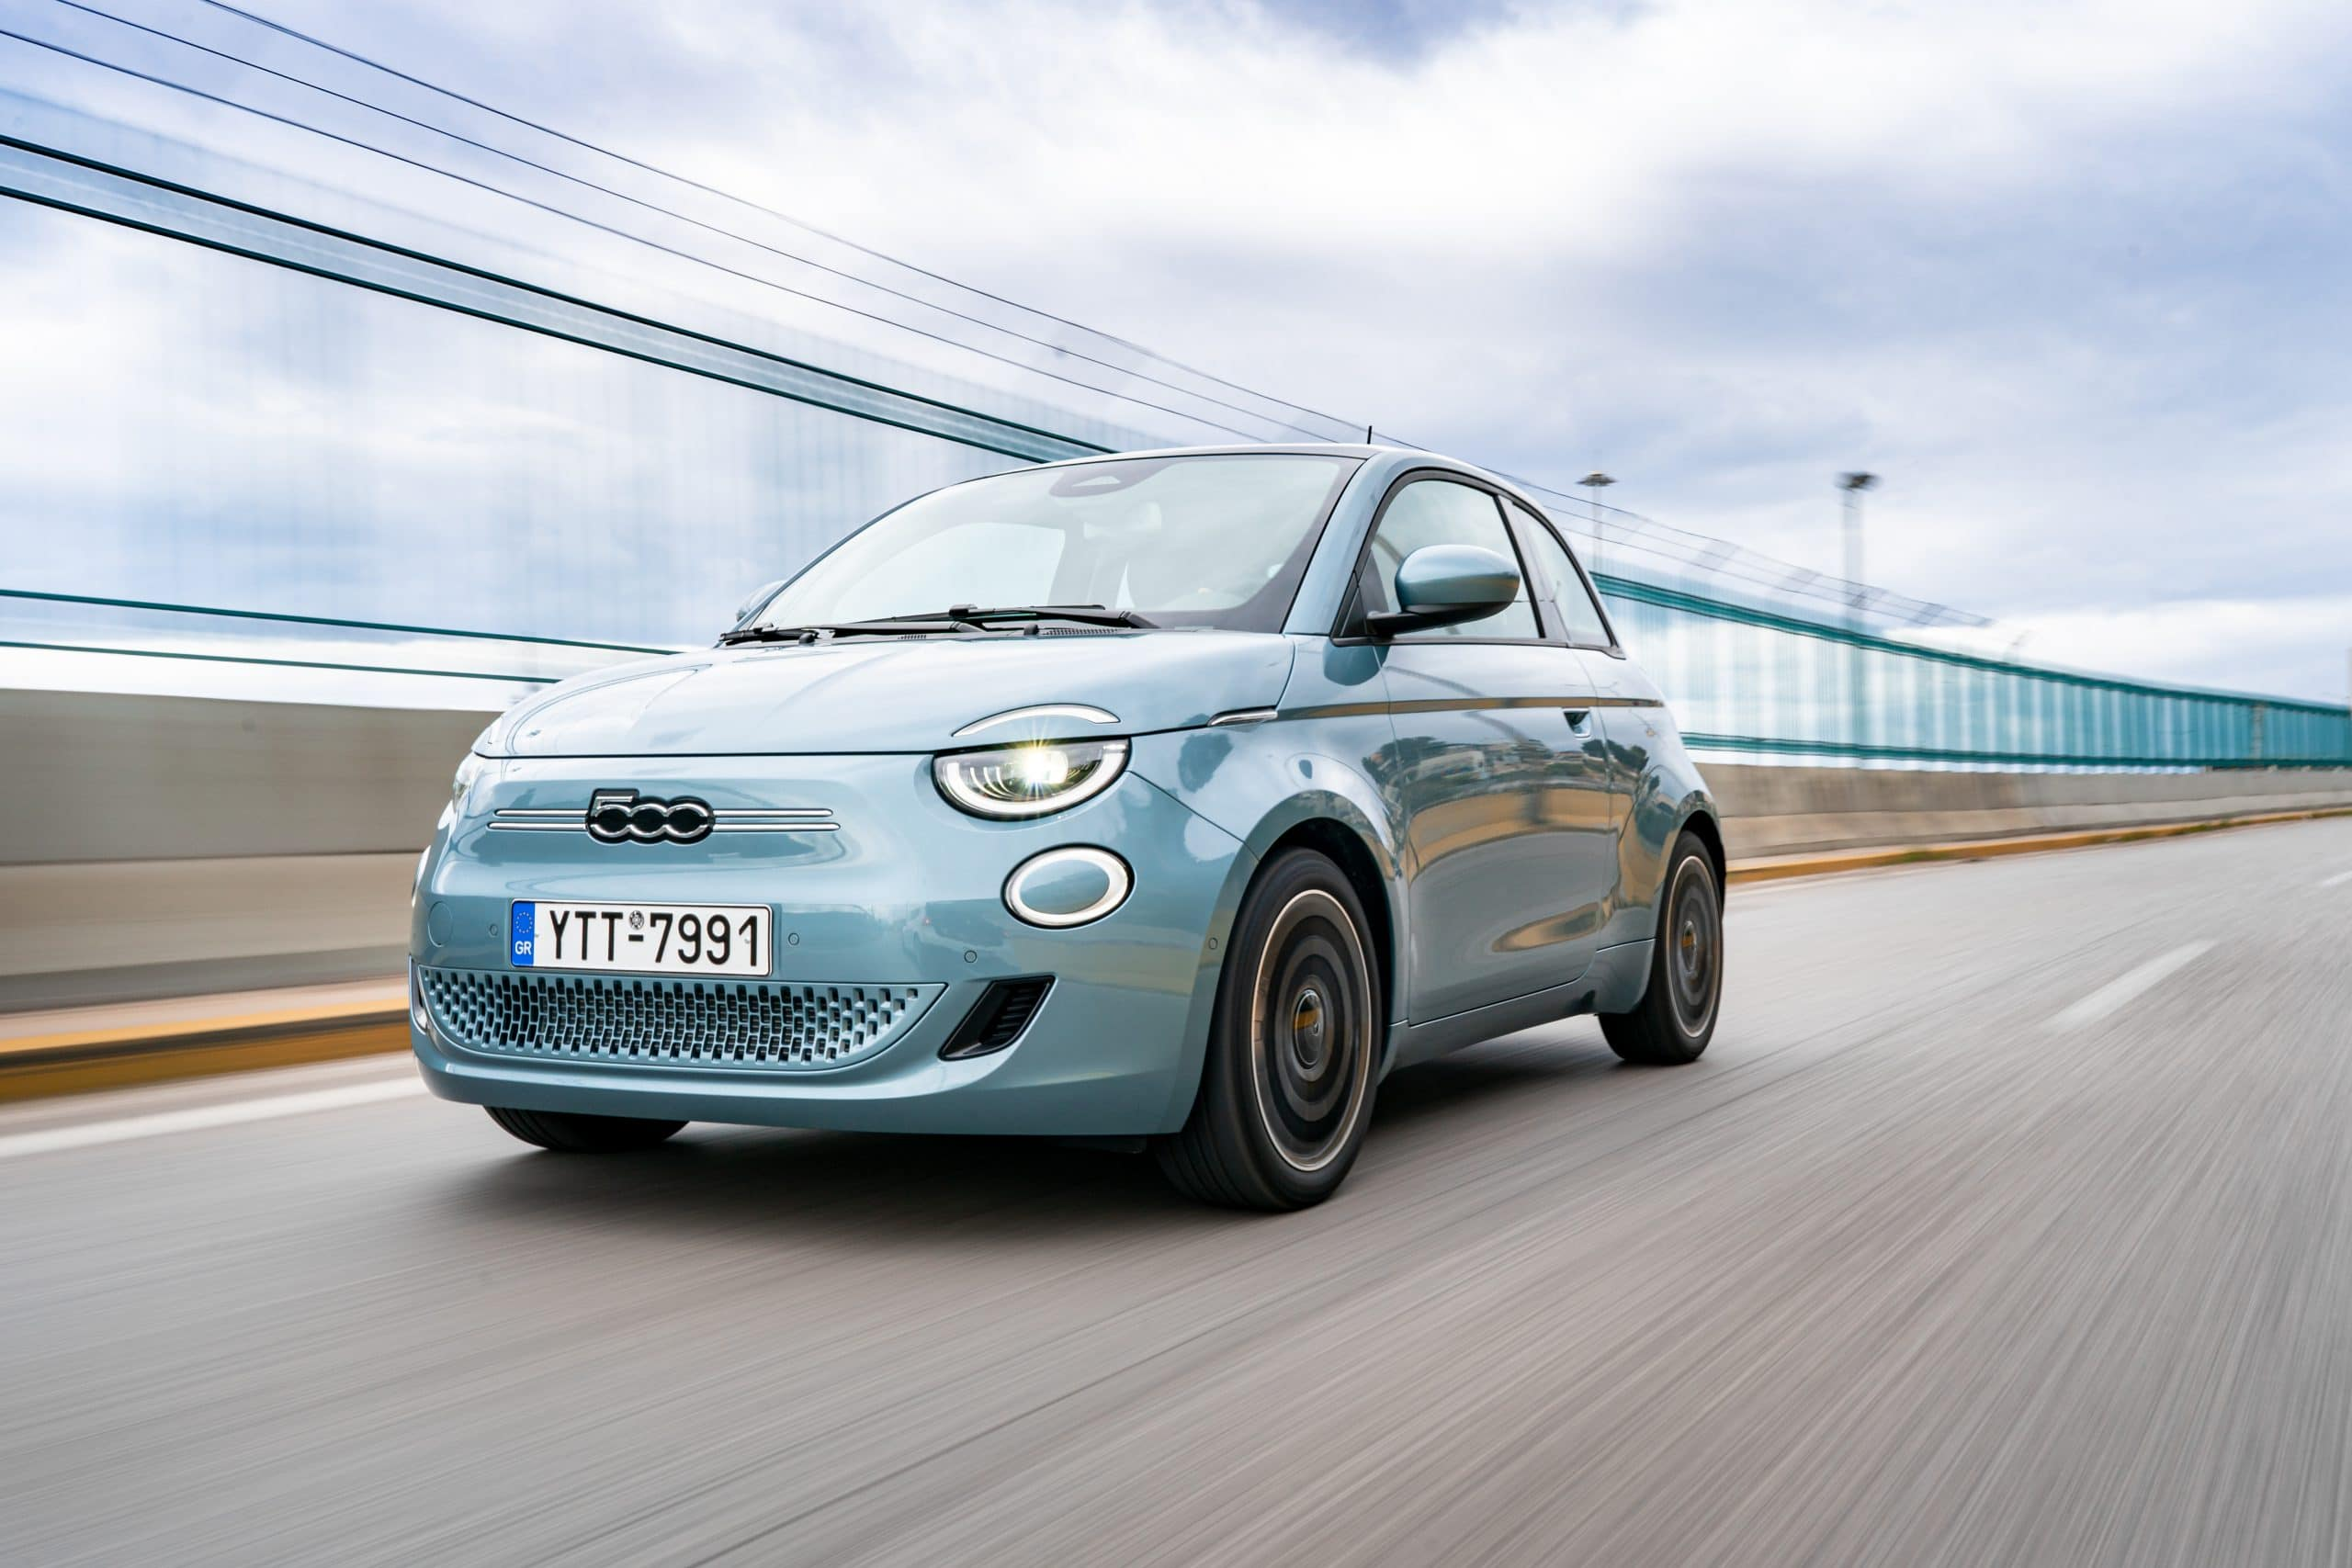 "DSC01852 scaled Οδηγείς ""πράσινα"" το ηλεκτρικό σου 500; Η Fiat σε επιβραβεύει! 500, 500e, Fiat, Fiat 500, Fiat 500e, ειδήσεις, ηλεκτρικά, ηλεκτροκινηση, Νέα"